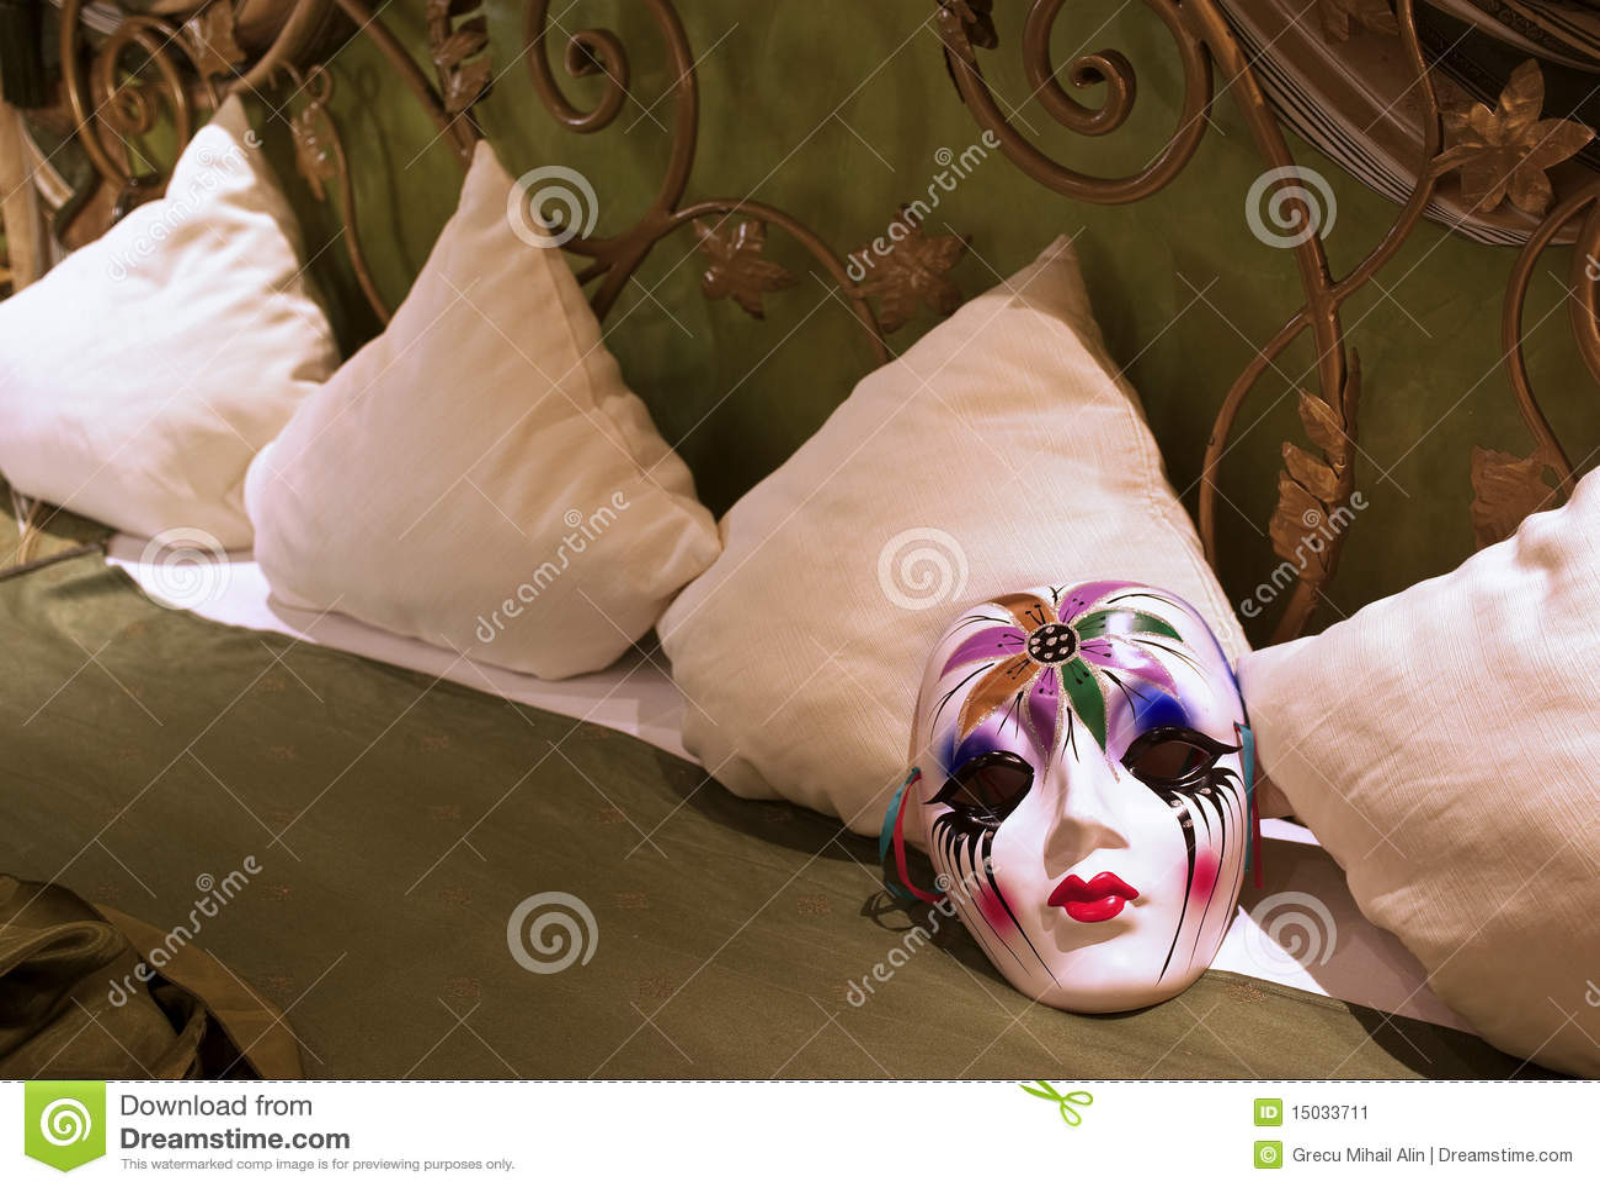 bedroom secrets stock image image 15033711